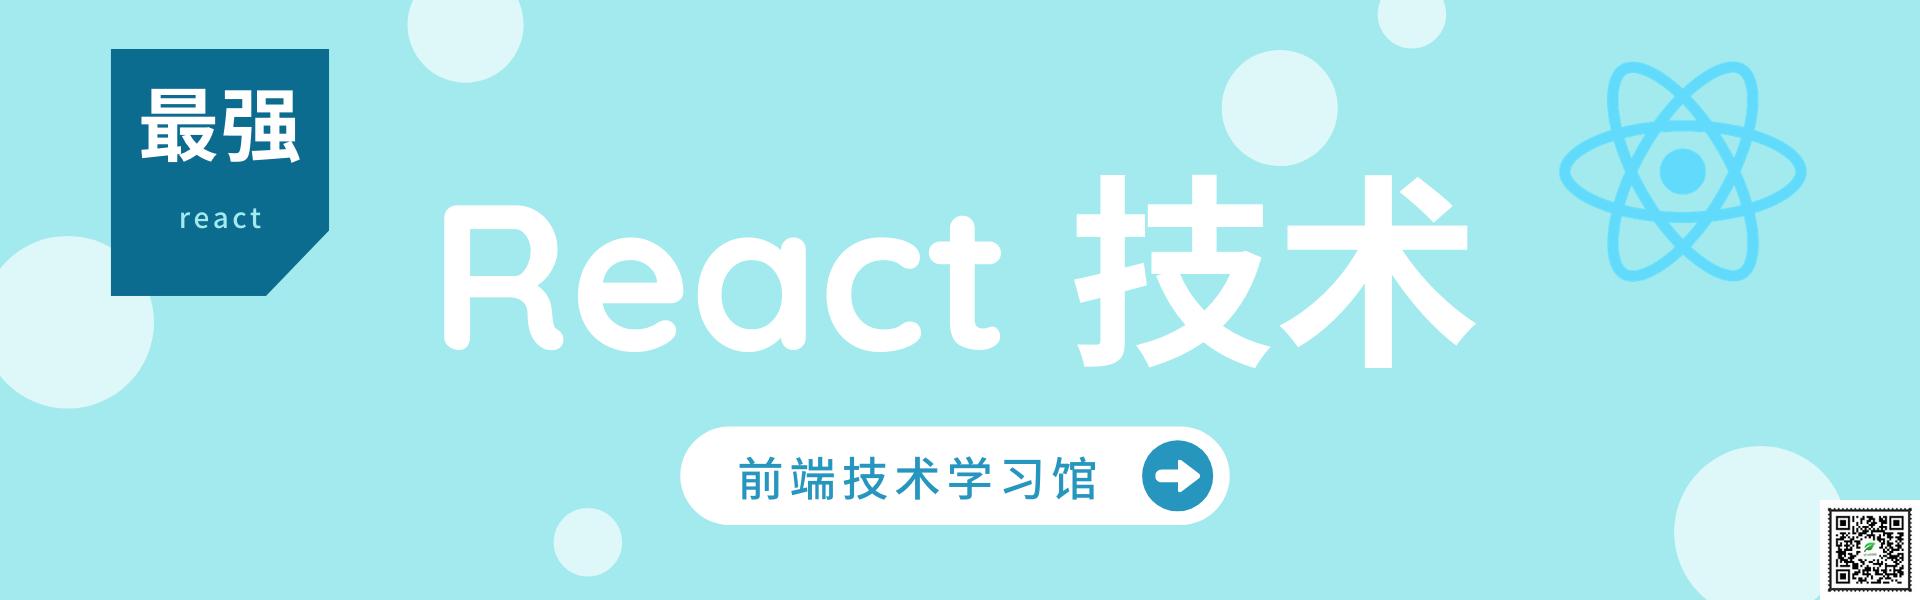 react 教程,react 视频教程,react 学习视频, react 学习教程